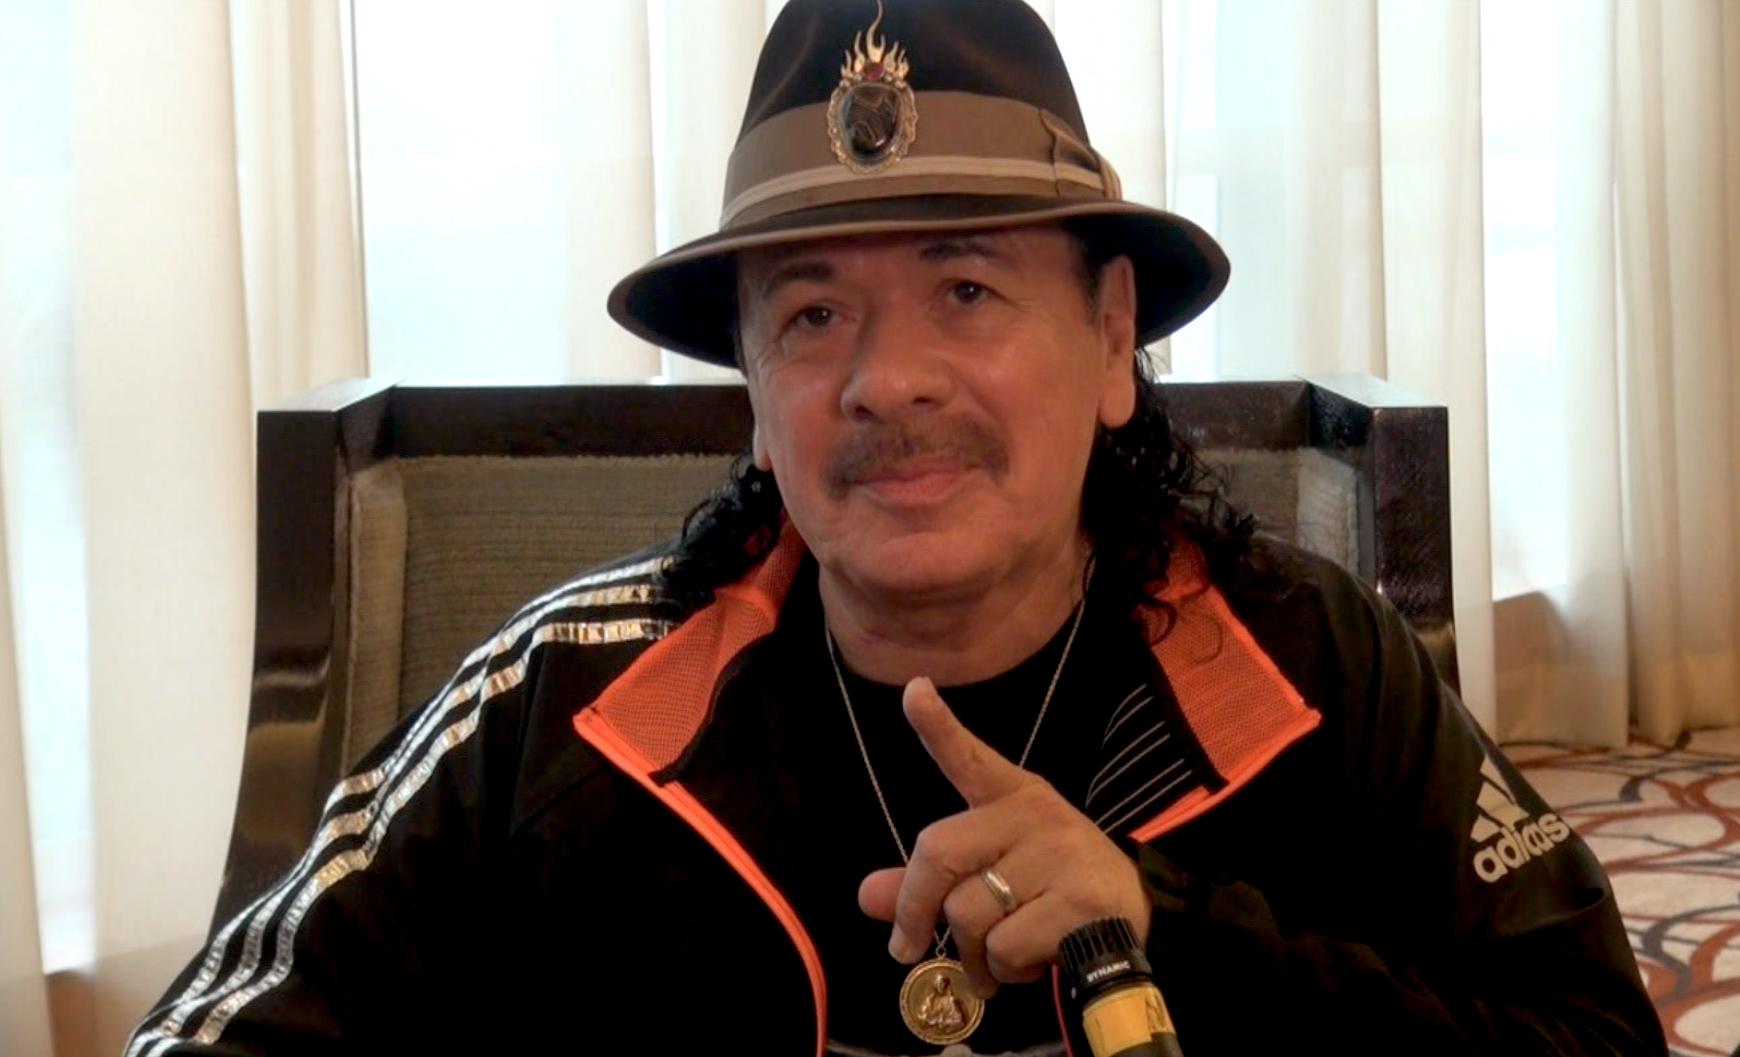 Image: Santana 1